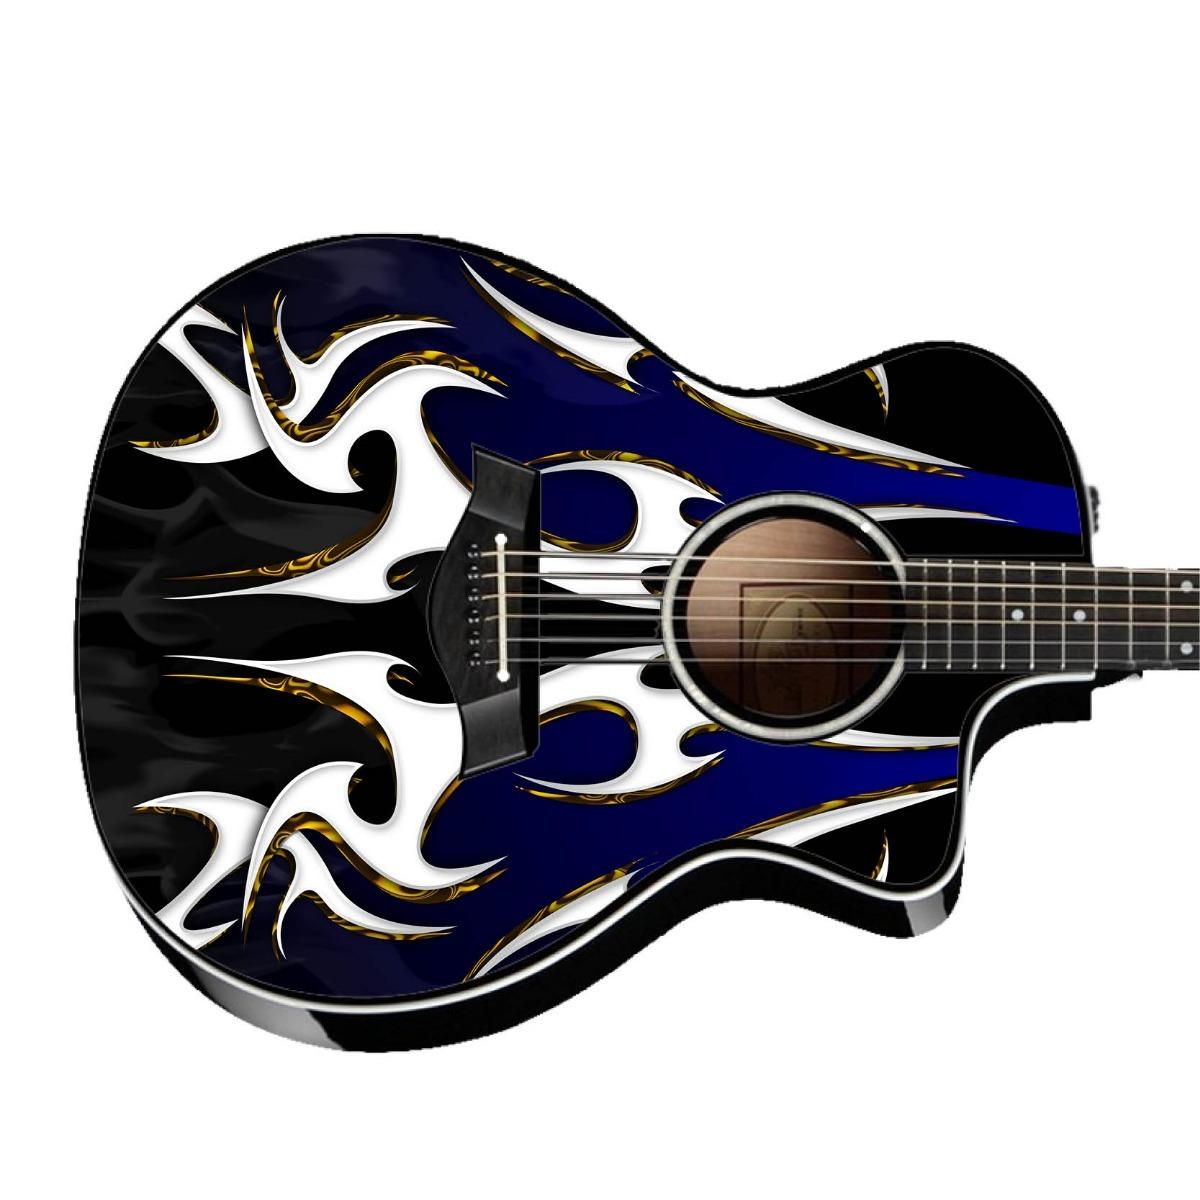 Skin Cgw Creativelab Tribal Flame 2 Adesivo Guitarra Violao R